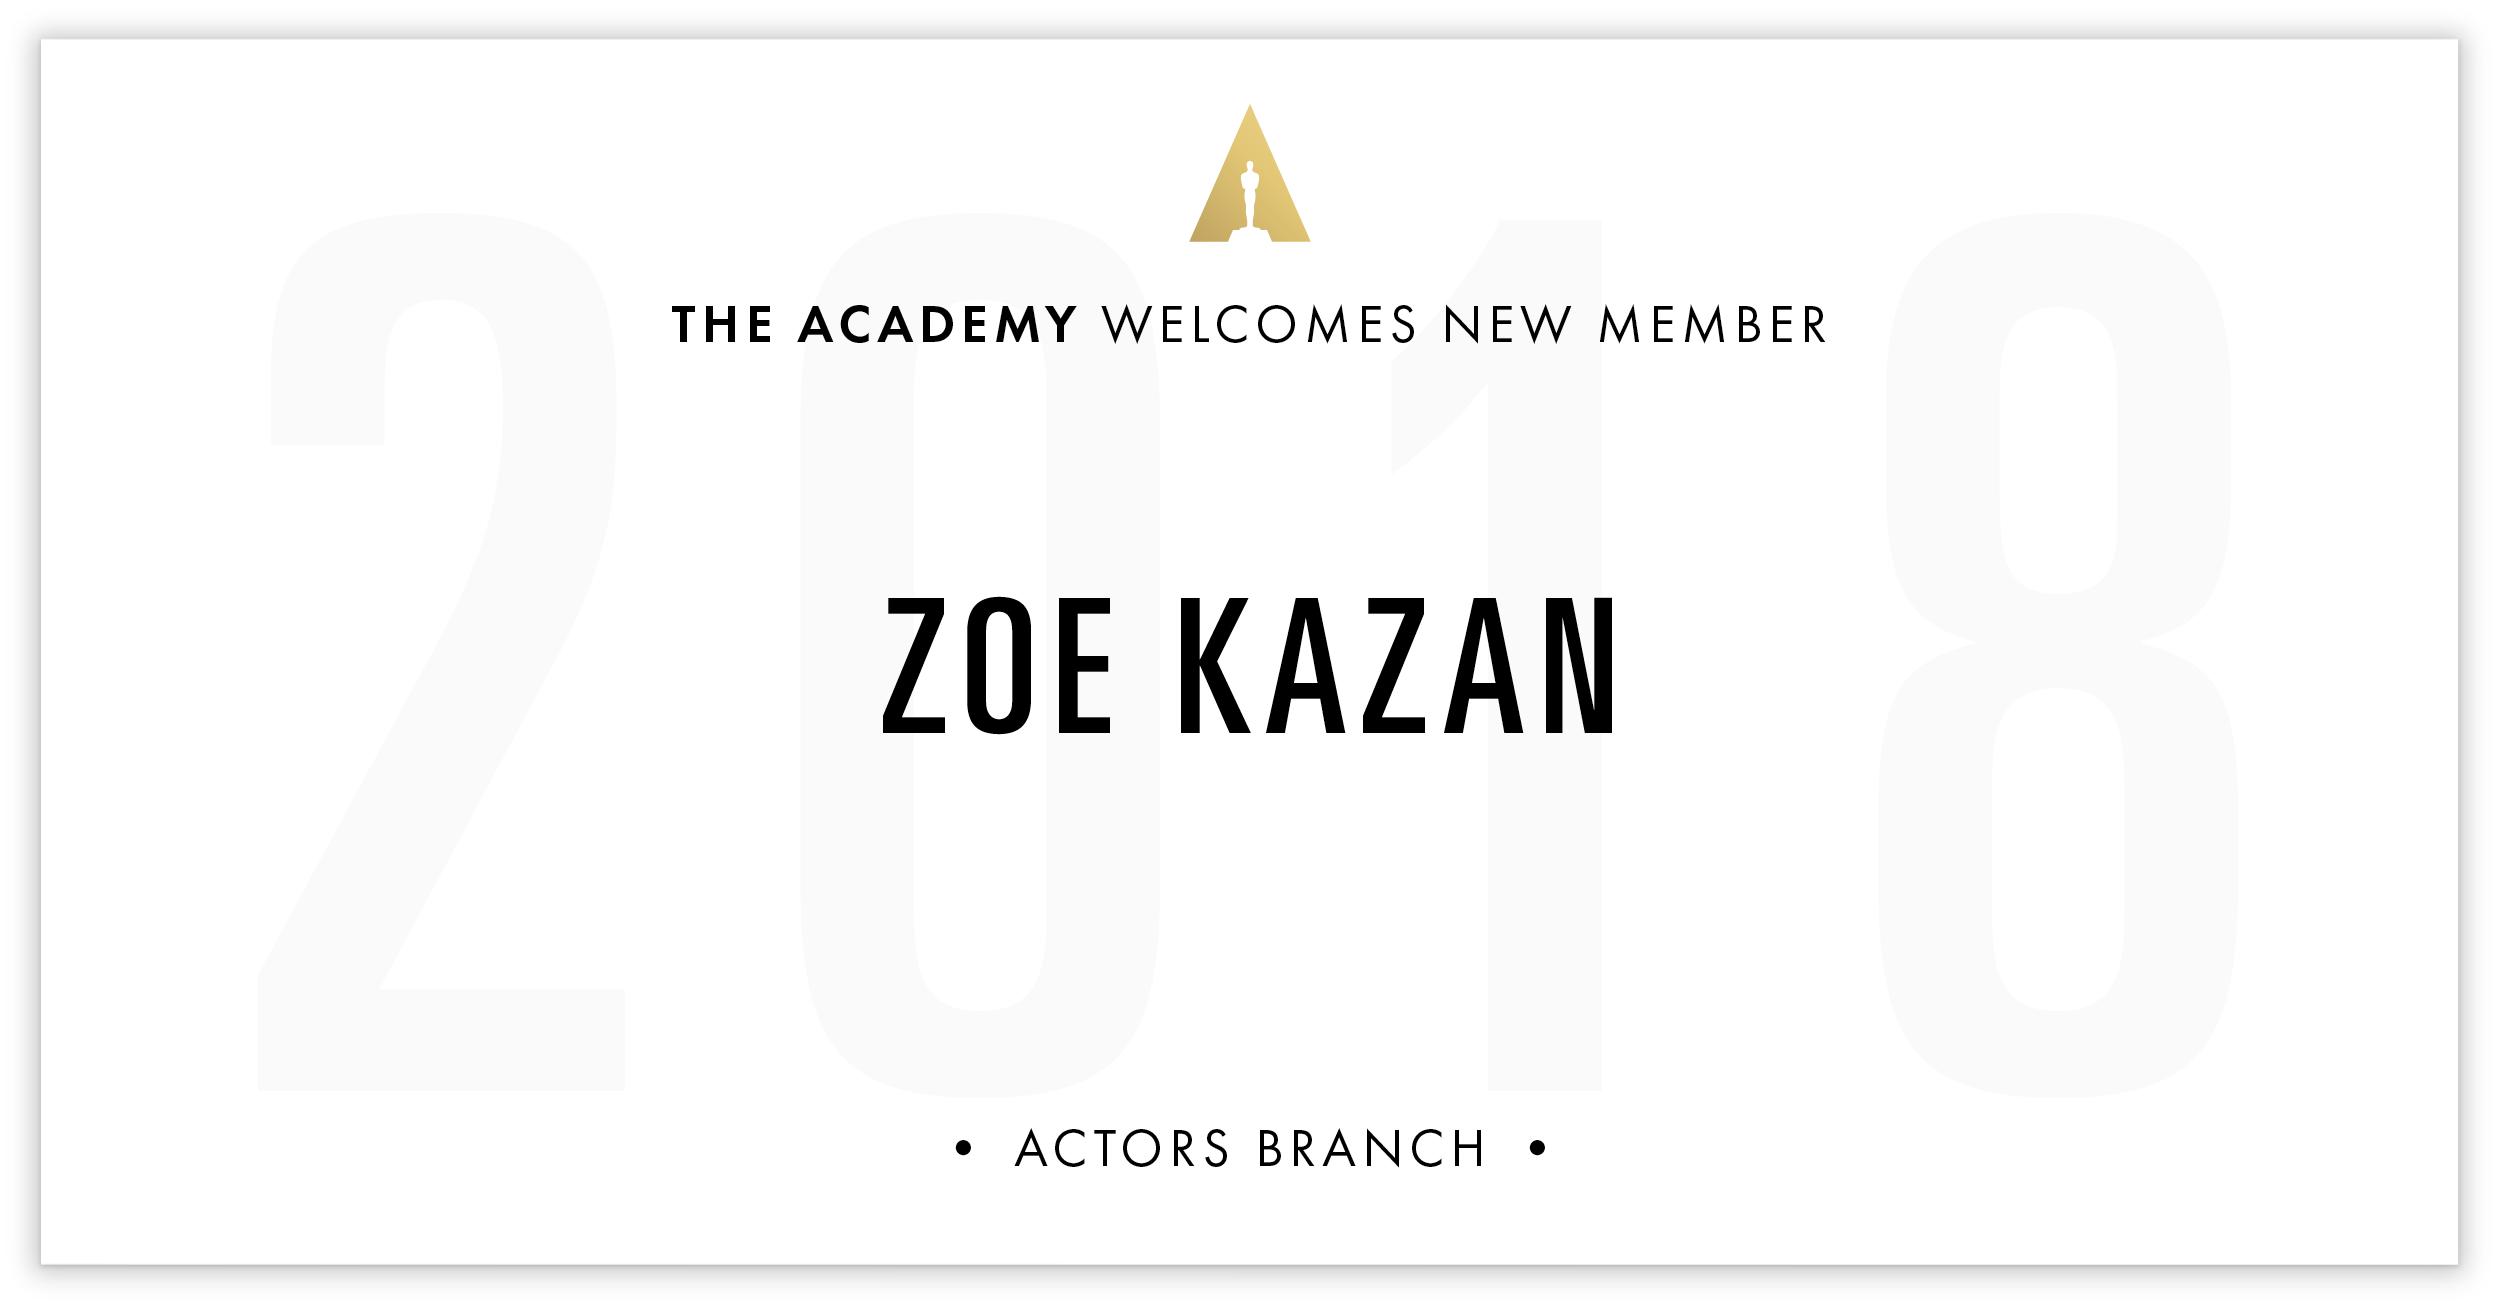 Zoe Kazan is invited!